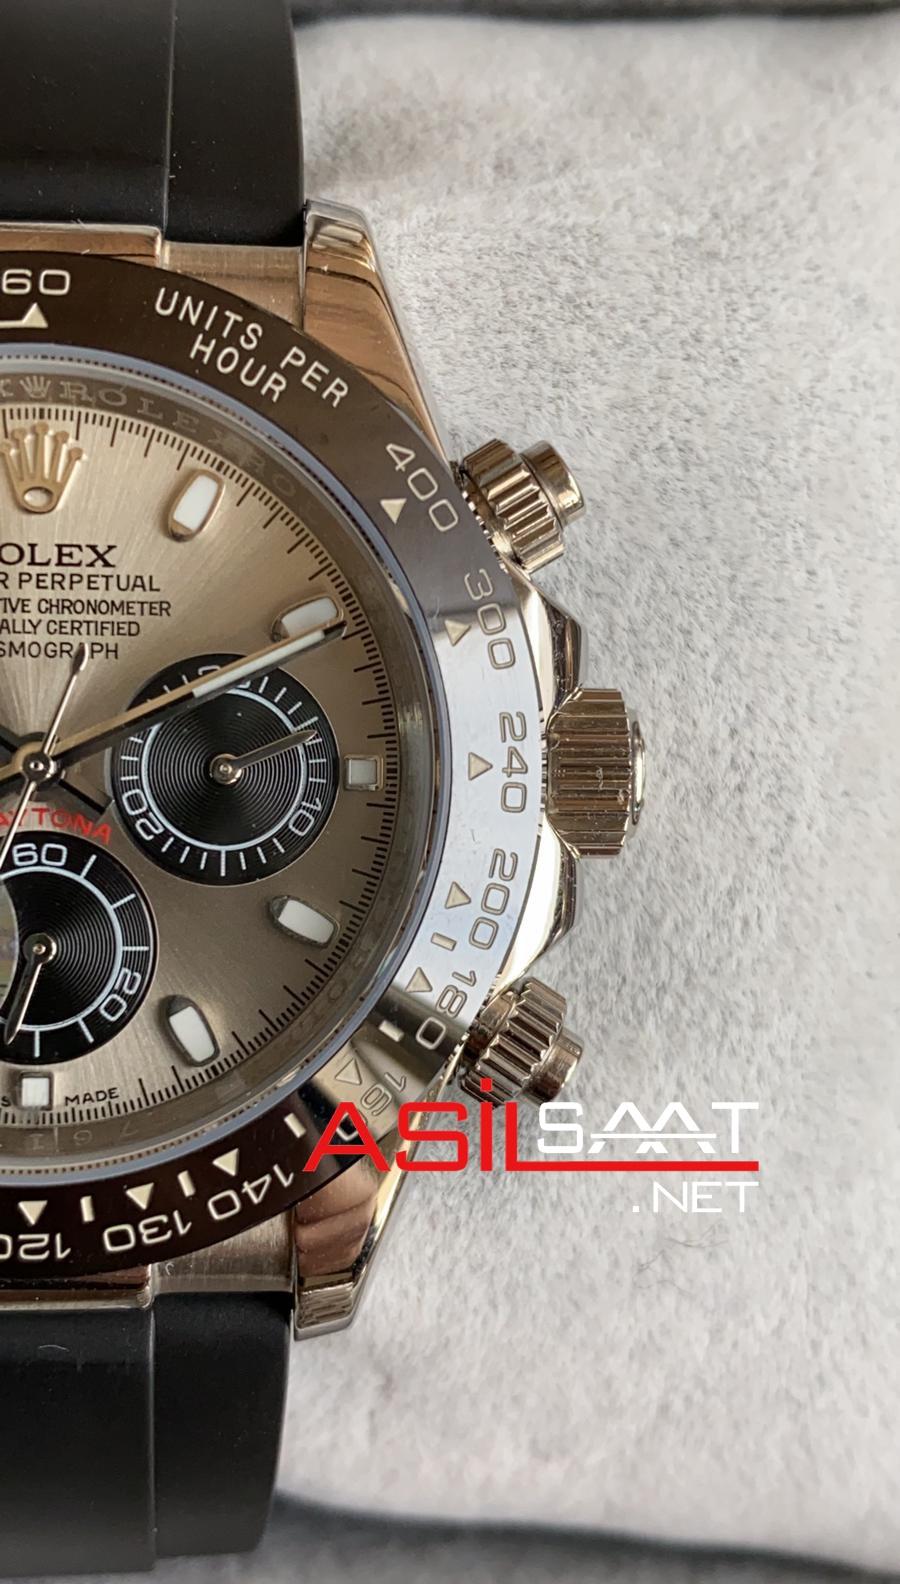 Rolex Oyster Perpetual Cosmograph Daytona Silver Black Replika Saat ROLDA025